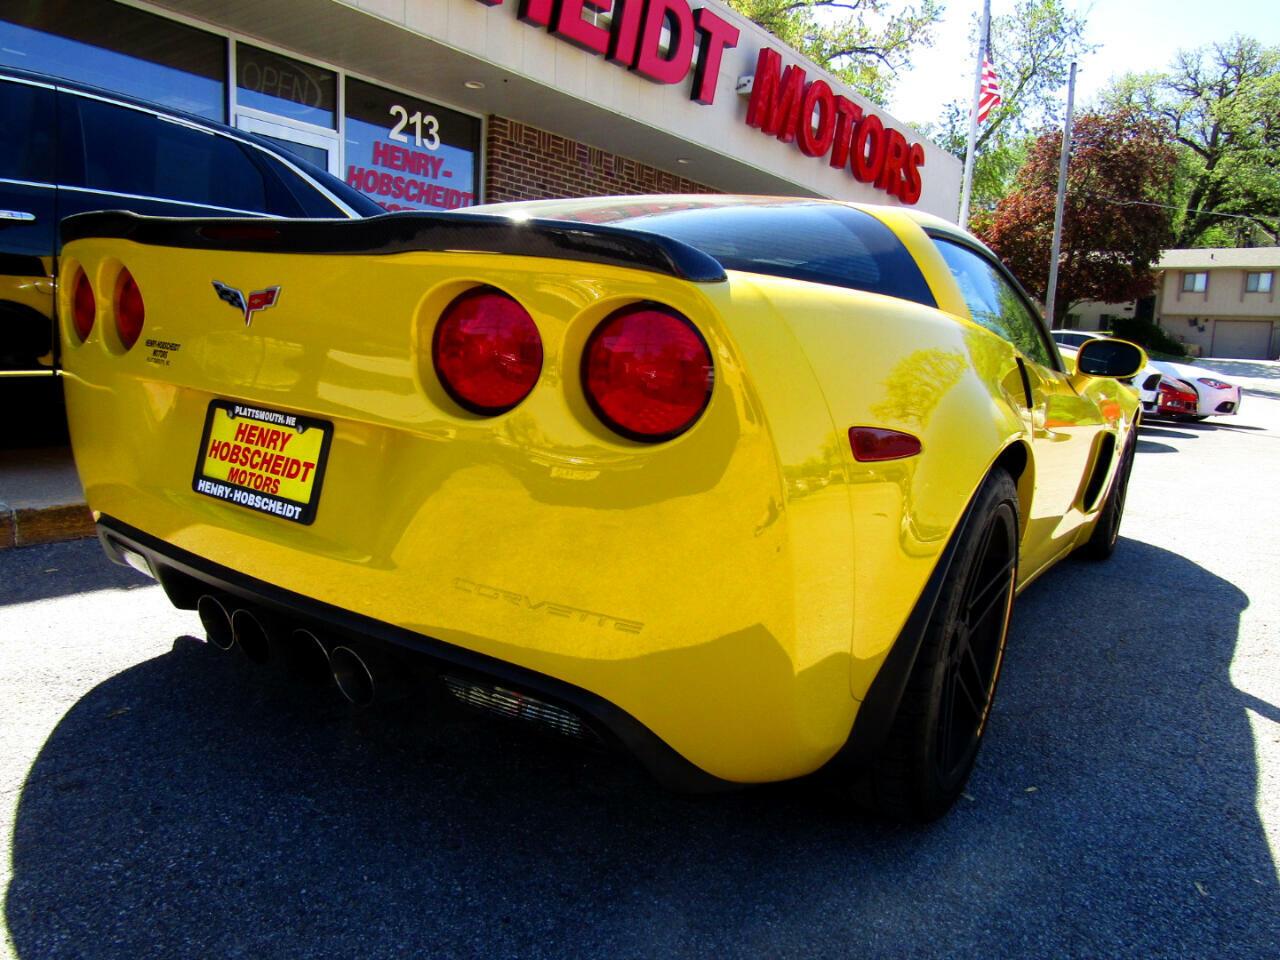 2006 Yellow Chevrolet Corvette Z06  | C6 Corvette Photo 8